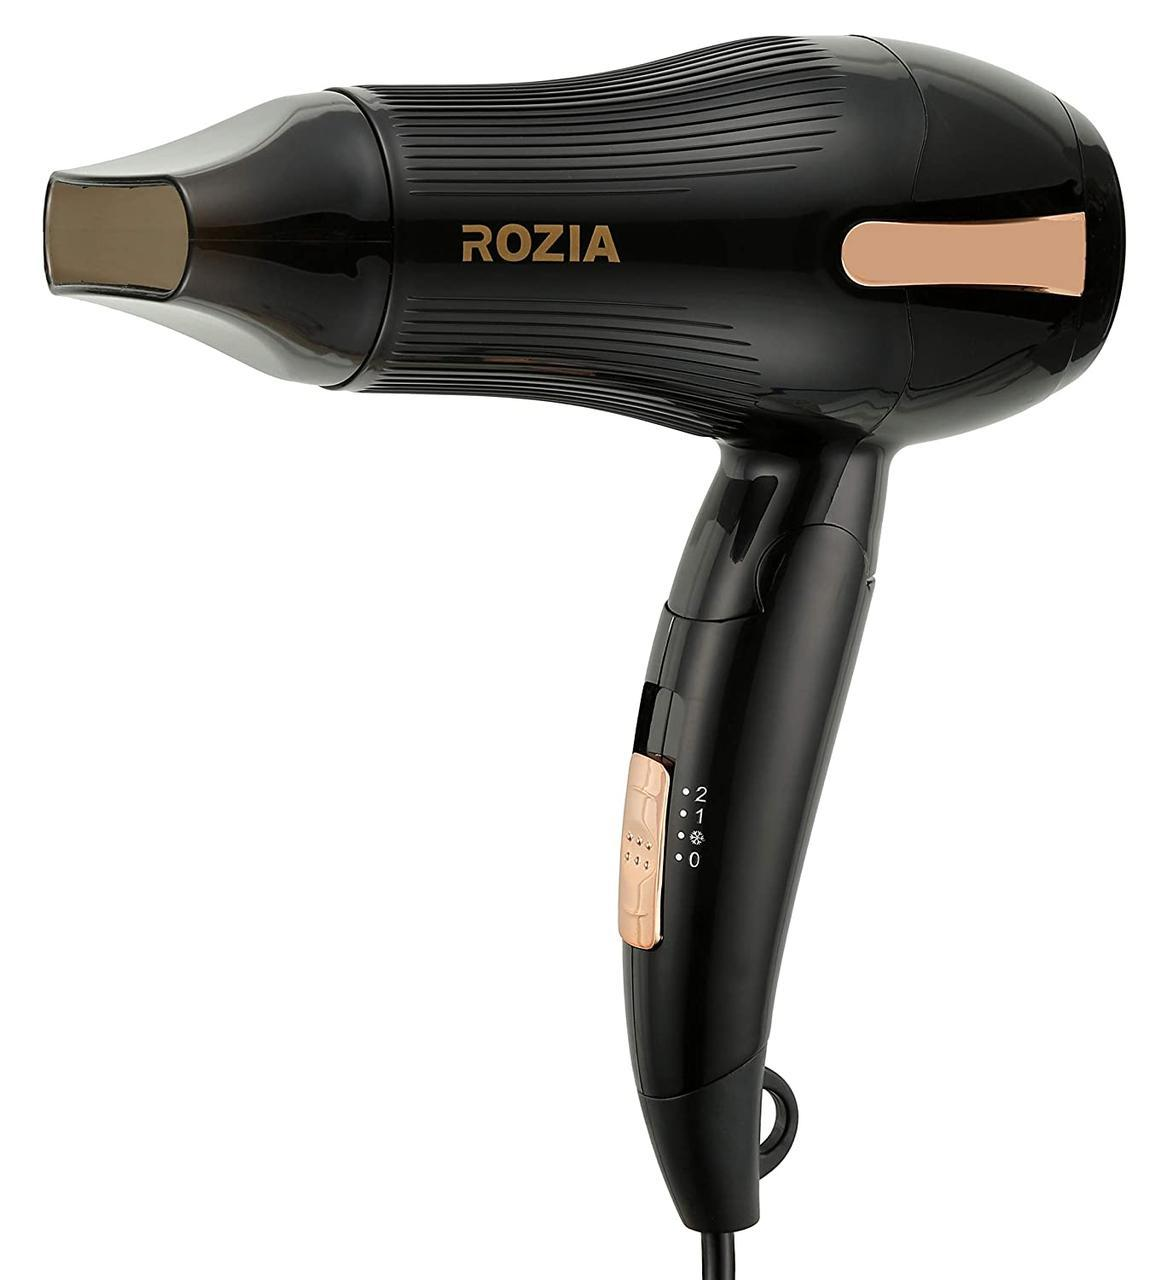 Дорожный фен для волос Rozia HC-8170 1200W (79-009015)